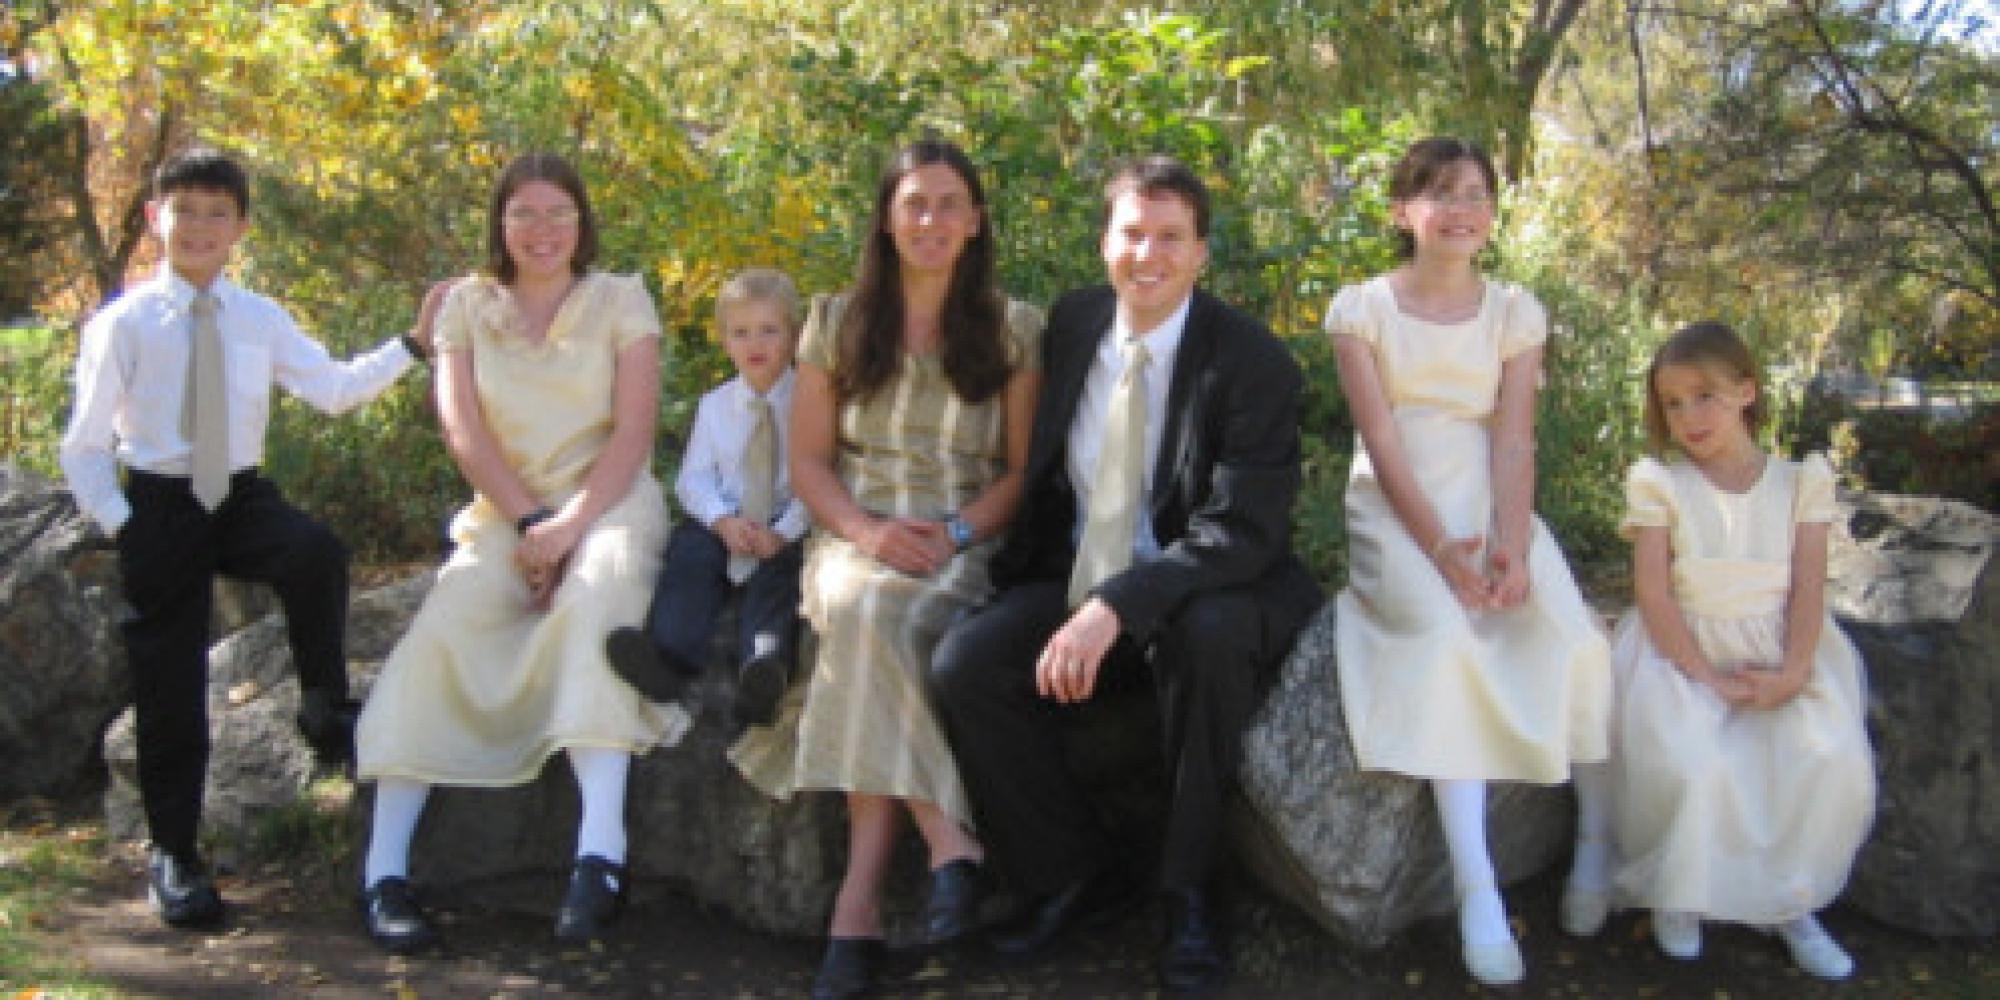 mormon-woman-hot